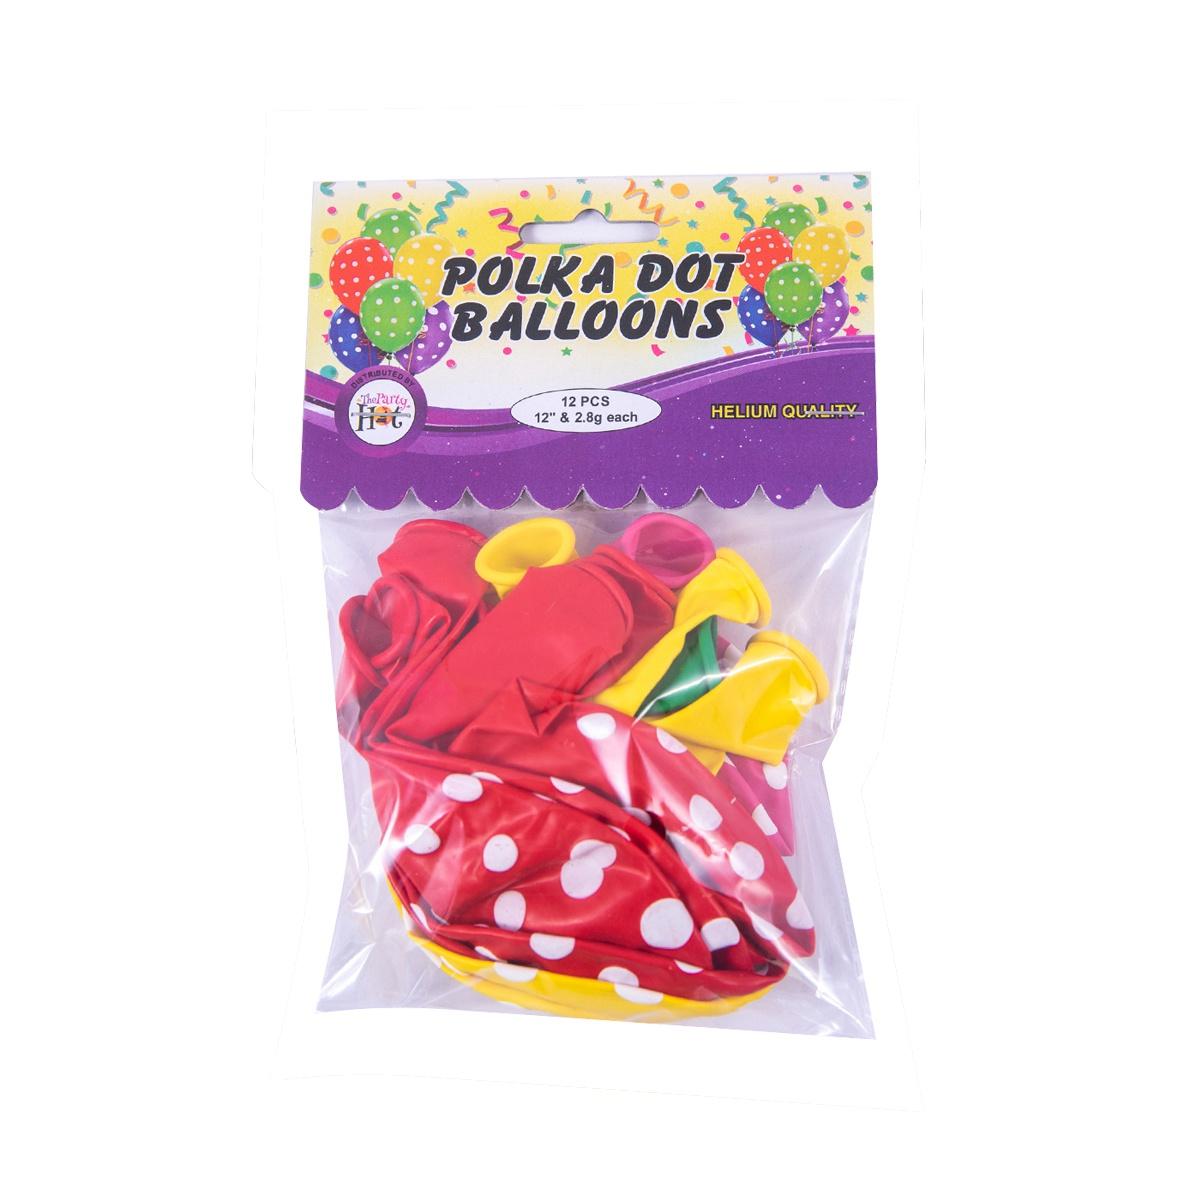 Ph Polka Dot Balloons 12 Pcs - in Sri Lanka